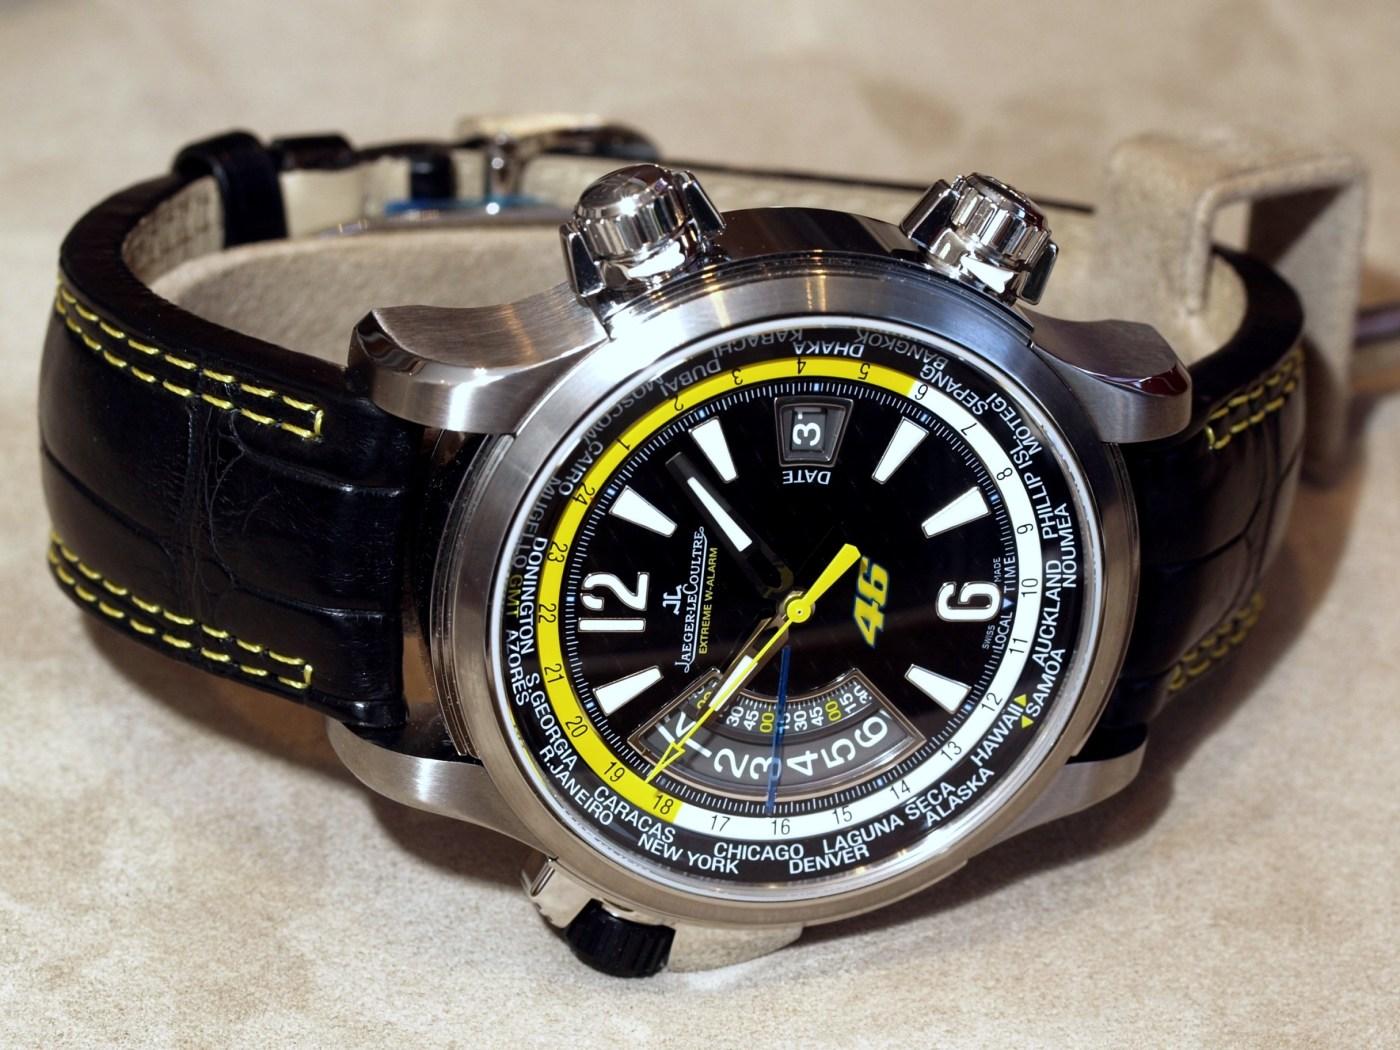 Jaeger-LeCoultre Master Compressor Extreme Alarm Valentino Rossi Edition